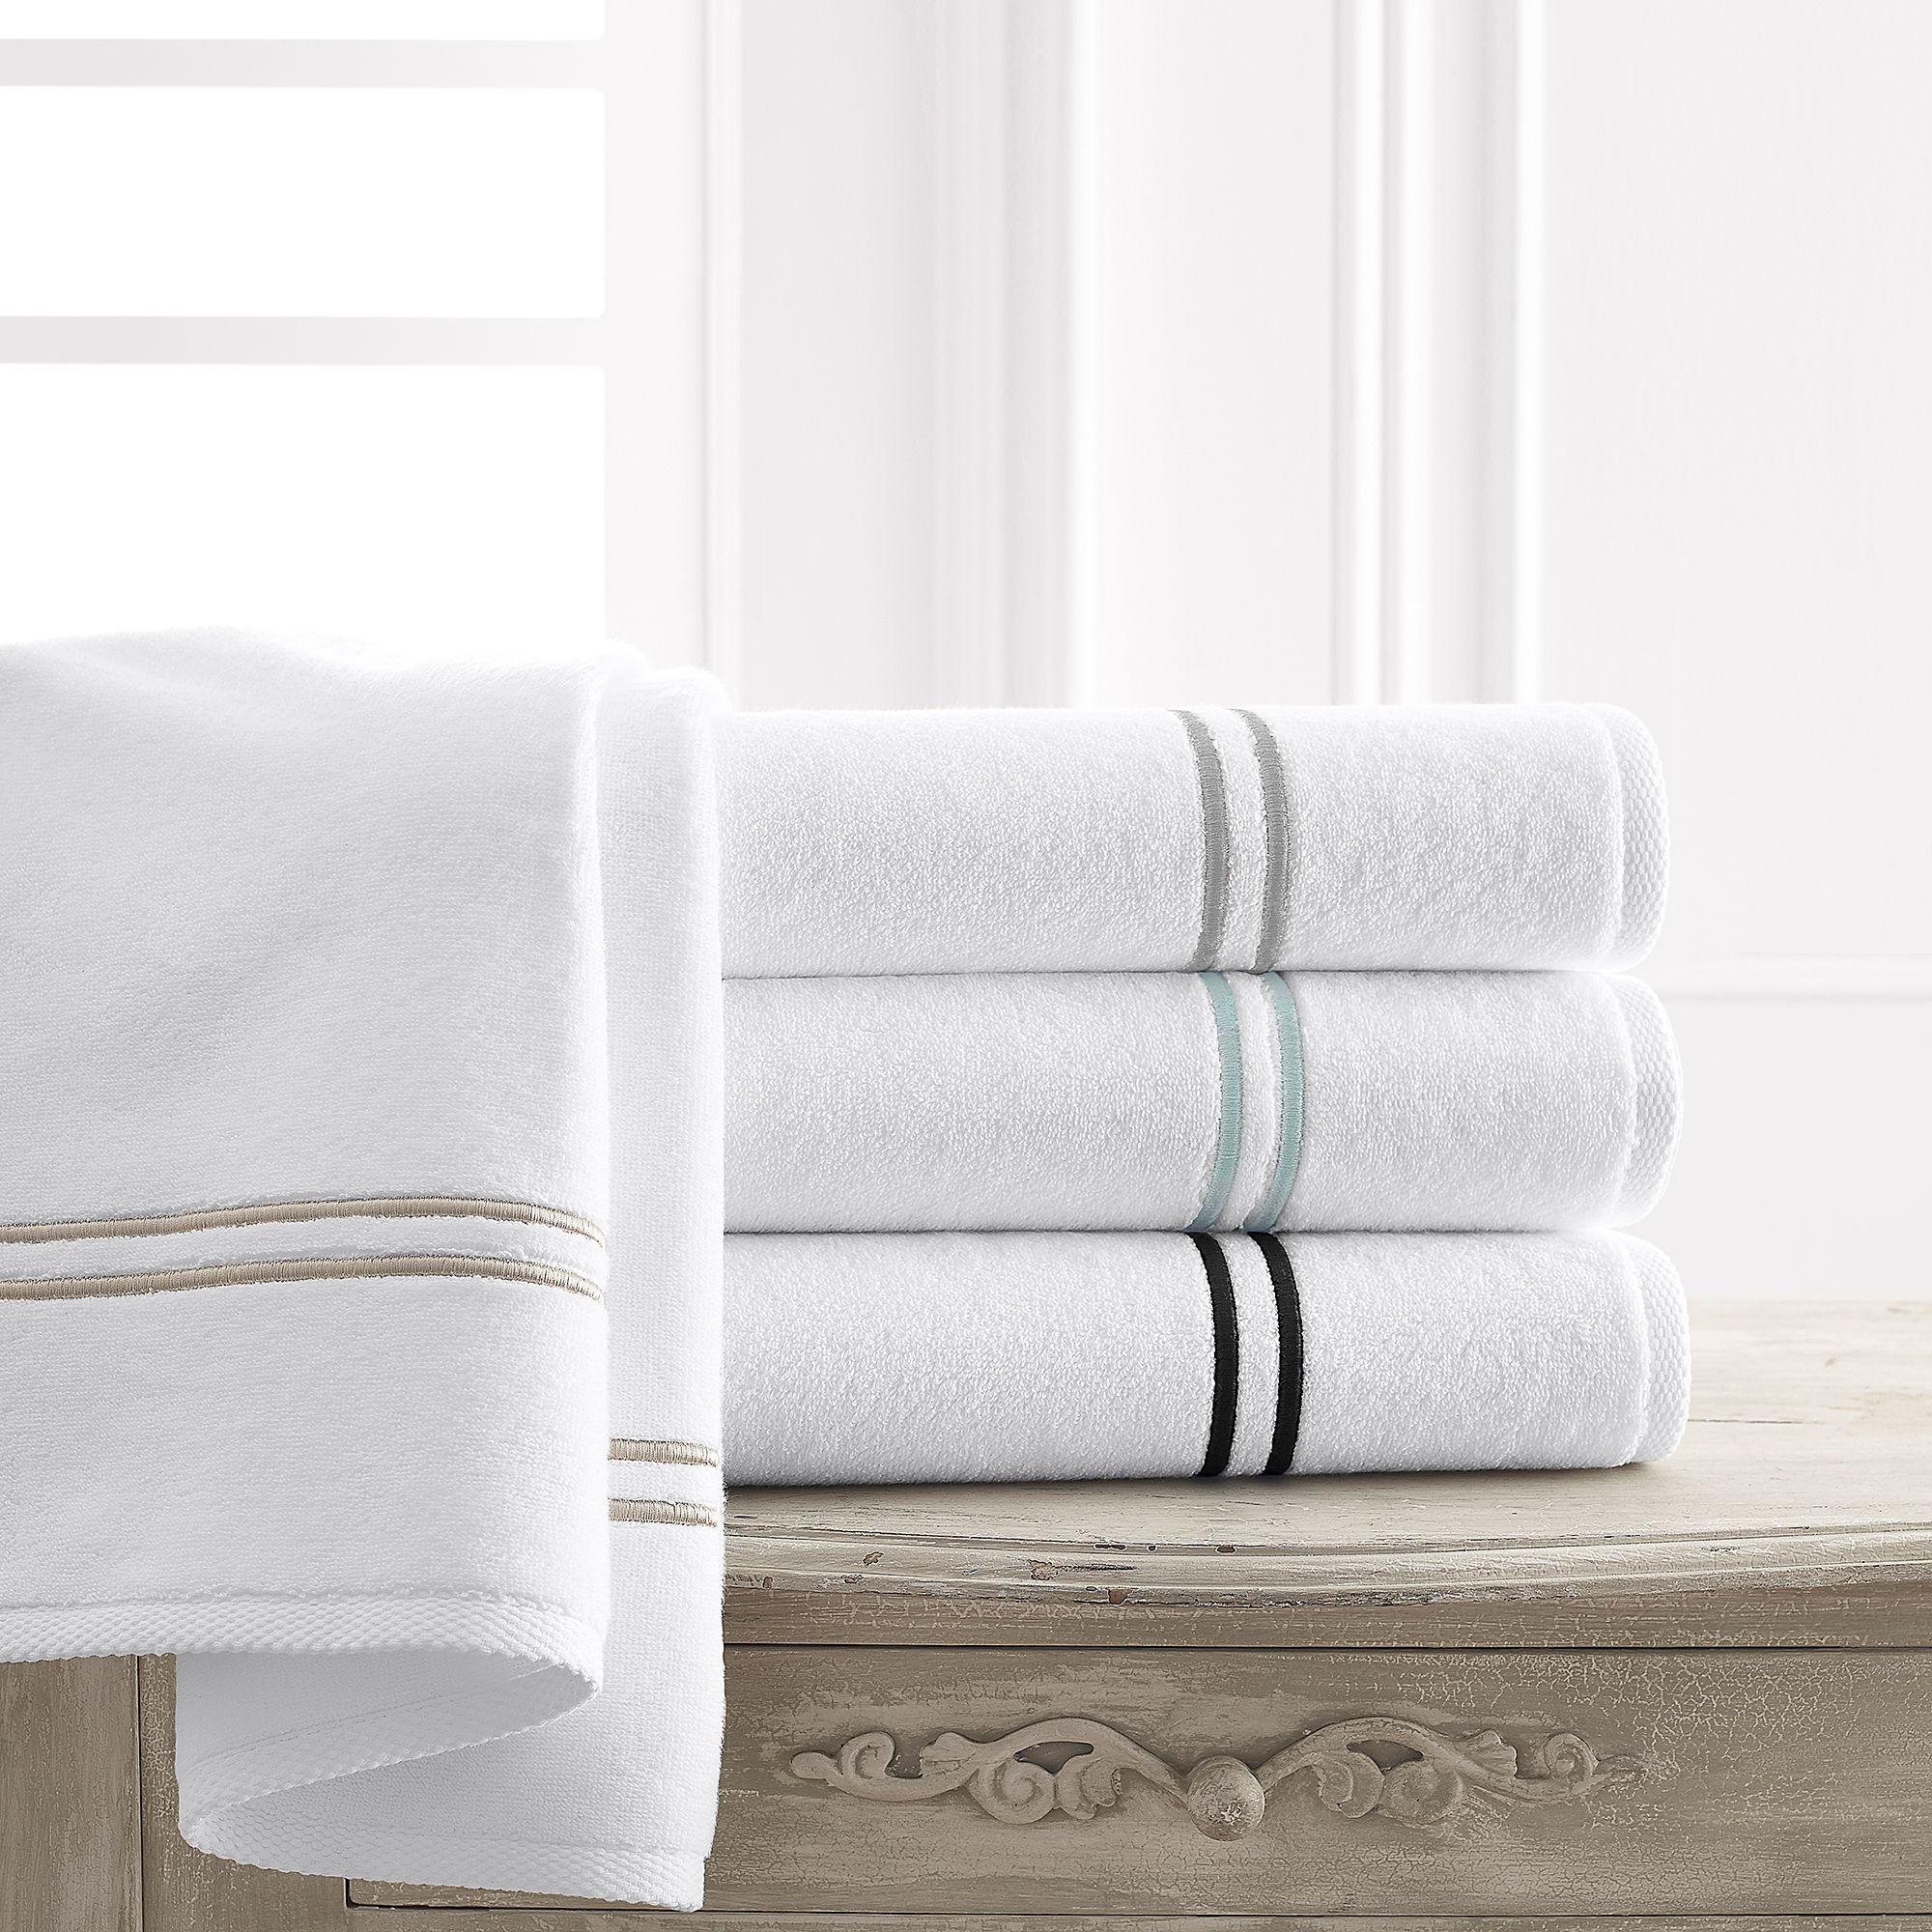 Kassatex Baratta Turkish Cotton Bath Towel Collection in